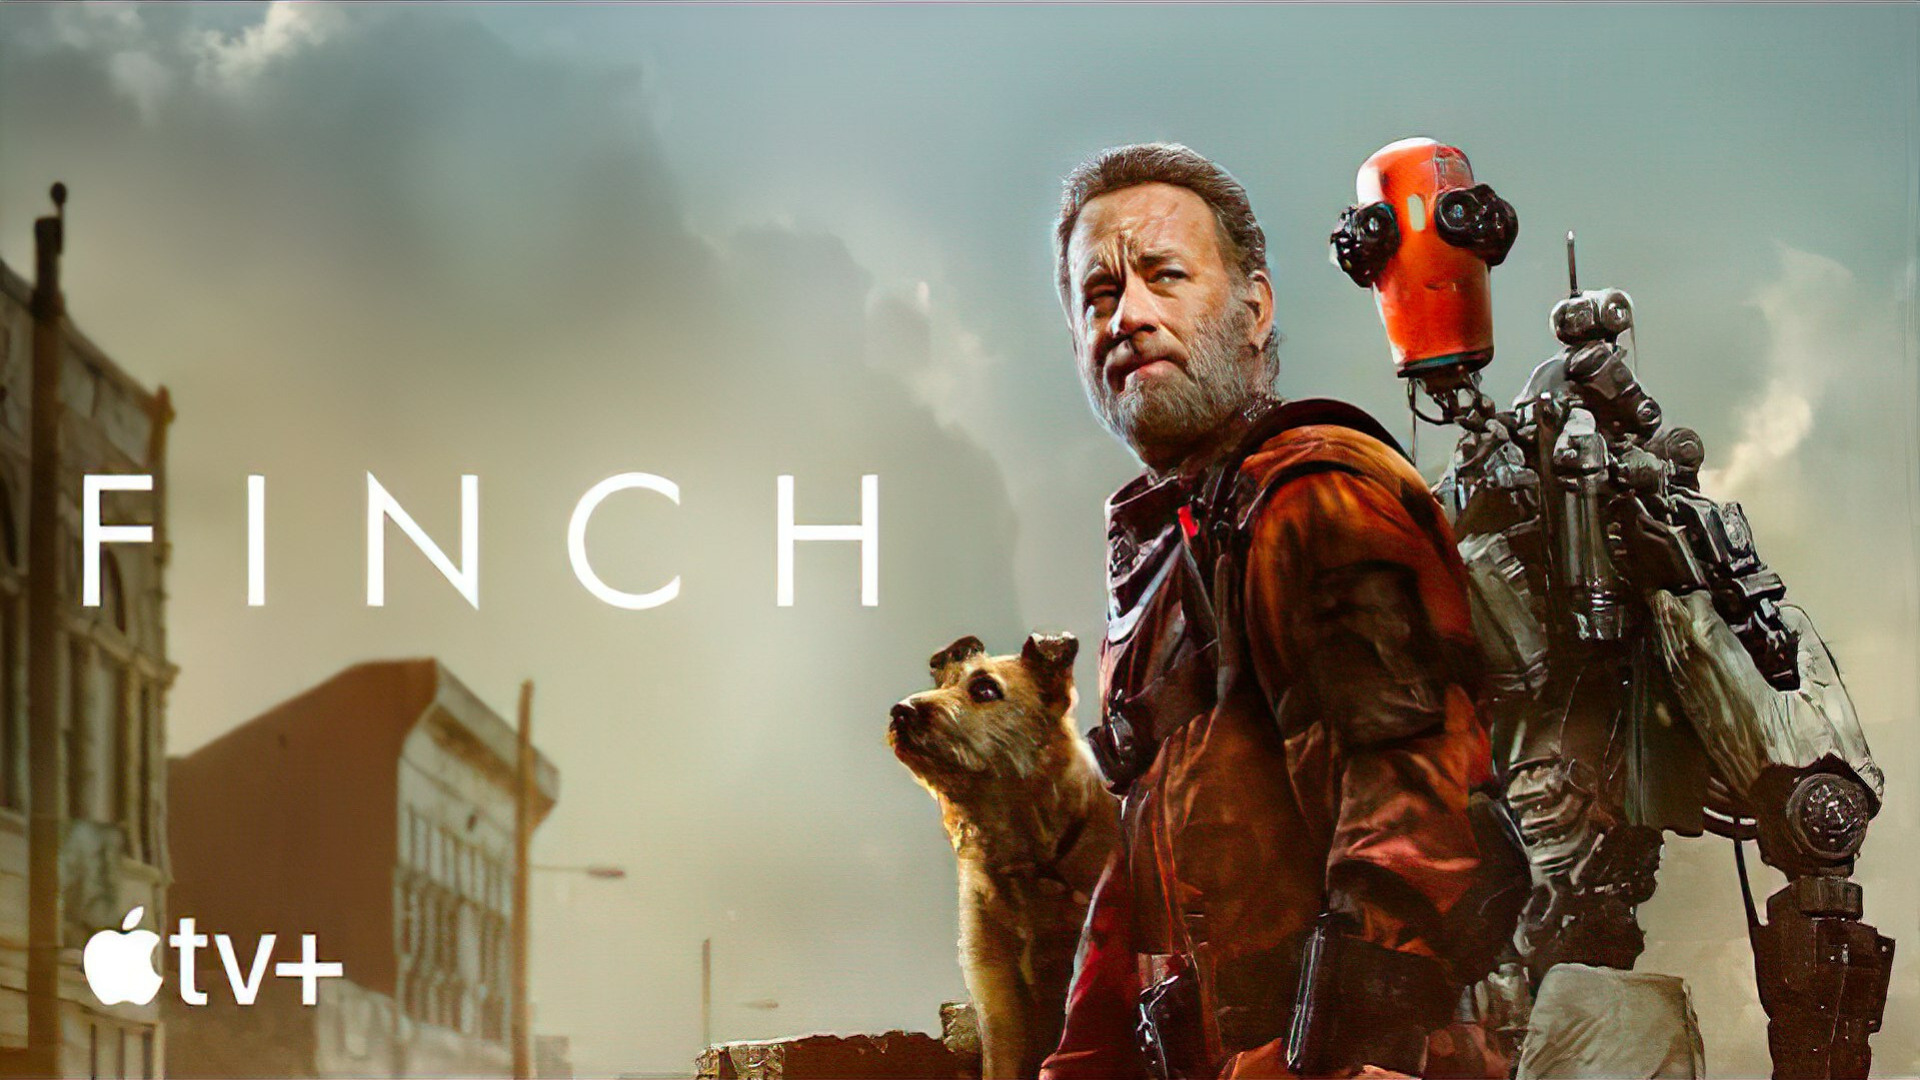 Apple, Trailer, Streaming, Film, Apple Tv, Apple TV+, Science Fiction, Apple TV Plus, Scifi, Tom Hanks, Finch